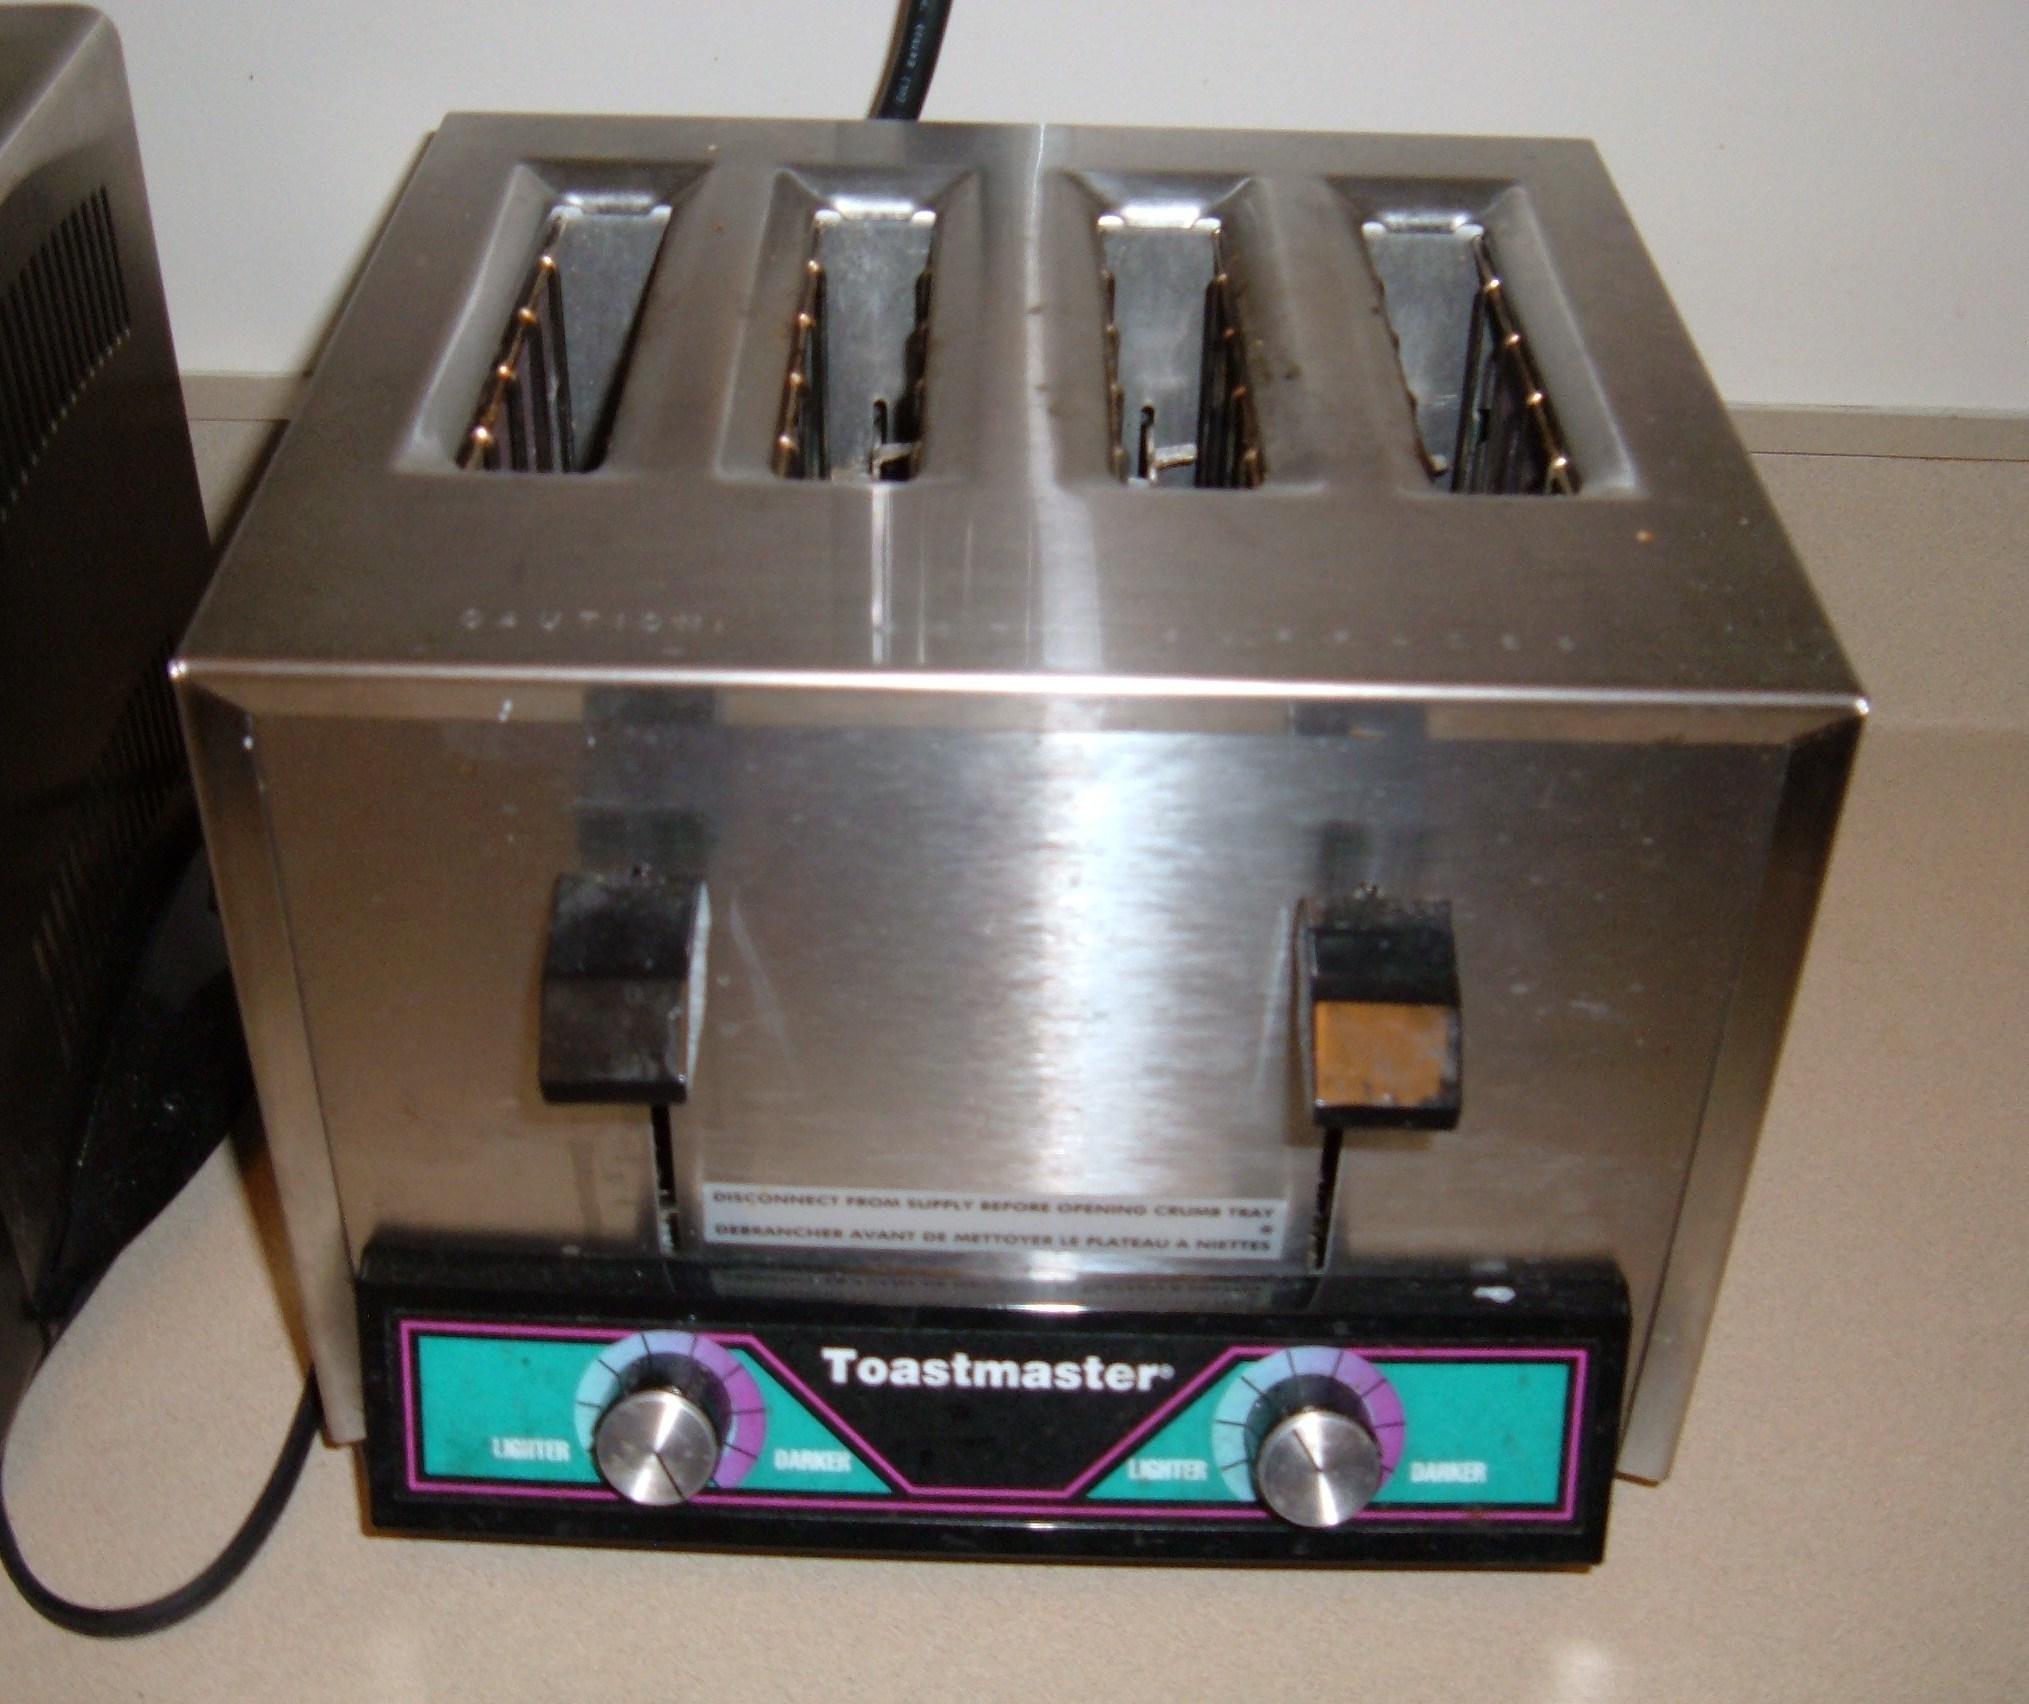 File Toastmaster toaster JPG Wikimedia mons